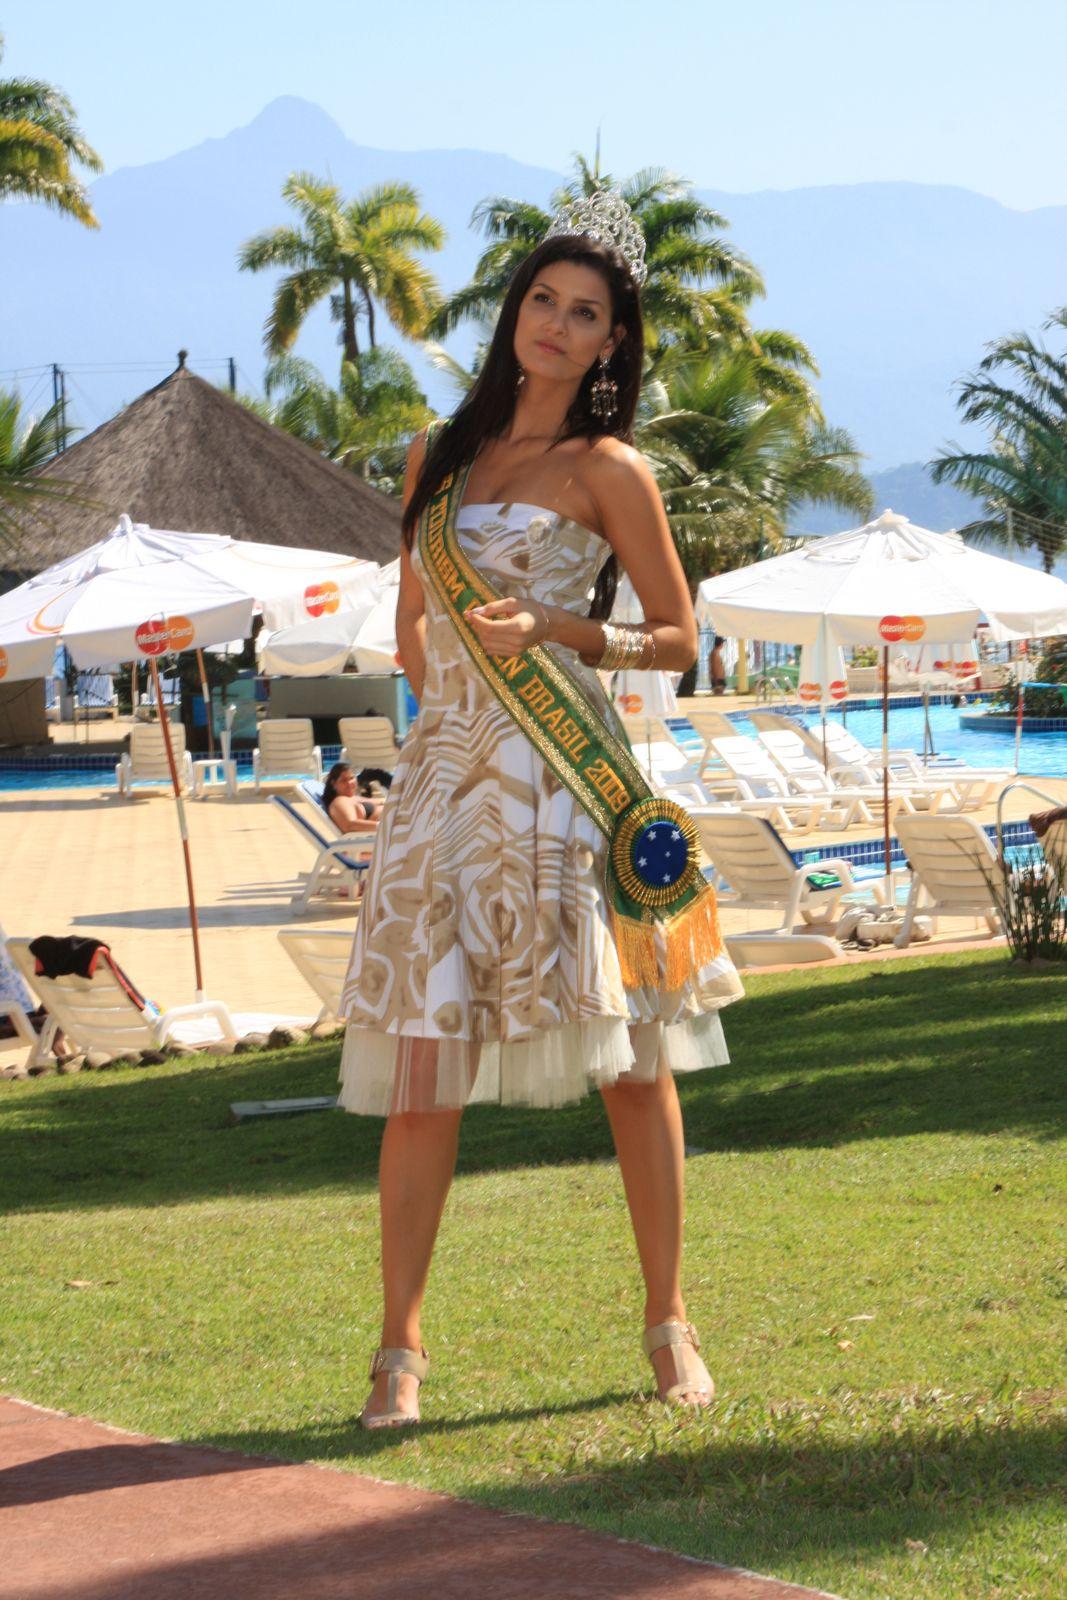 vivian noronha, rainha hispanoamericana 2008. suplente. - Página 2 7dtydw2l